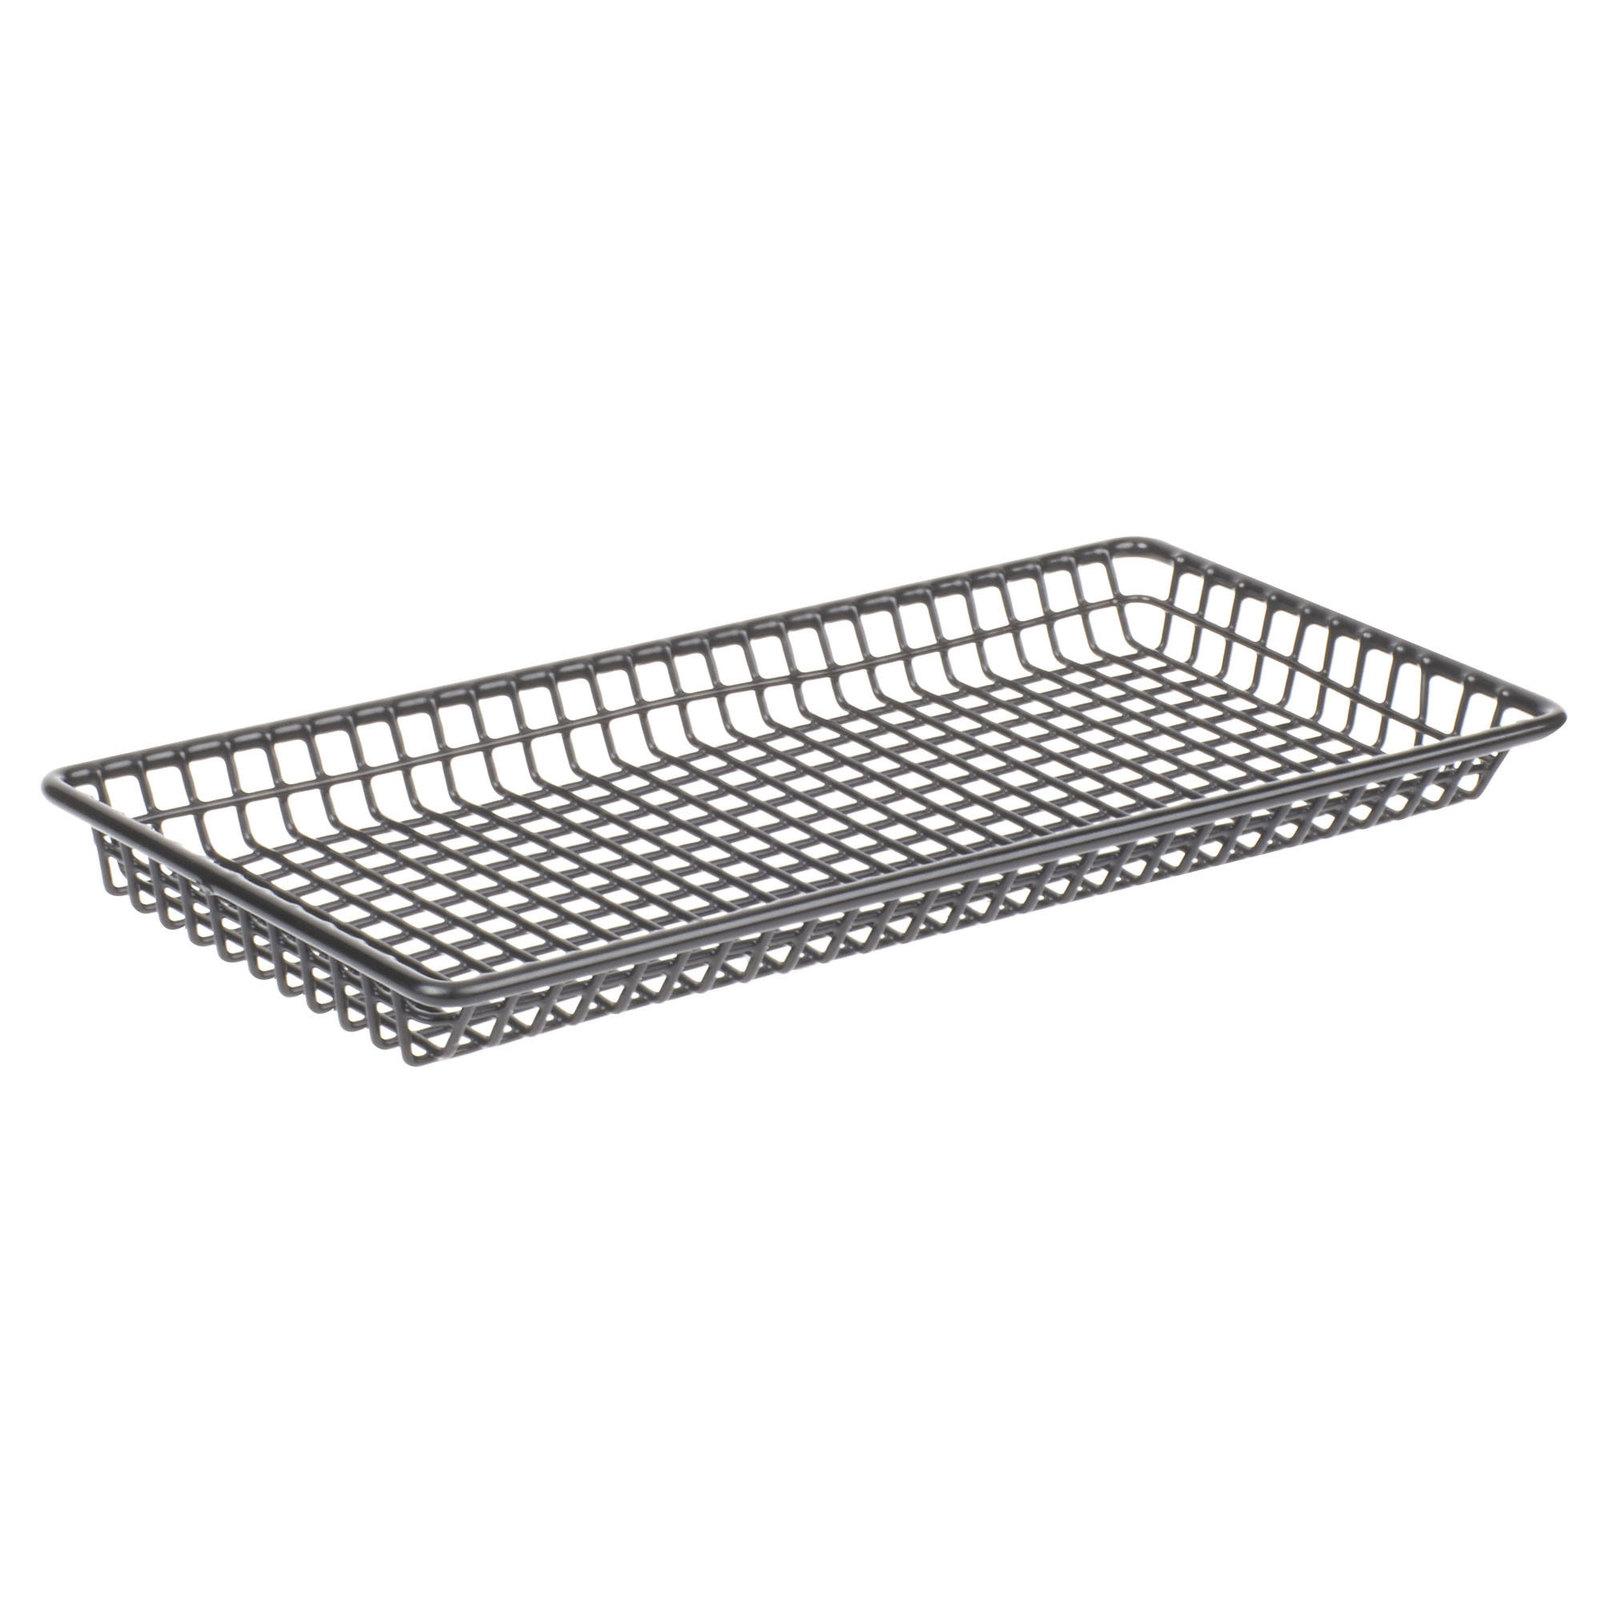 14 X 7 Rectangular Grid Basket 1 Tall Case Of 12